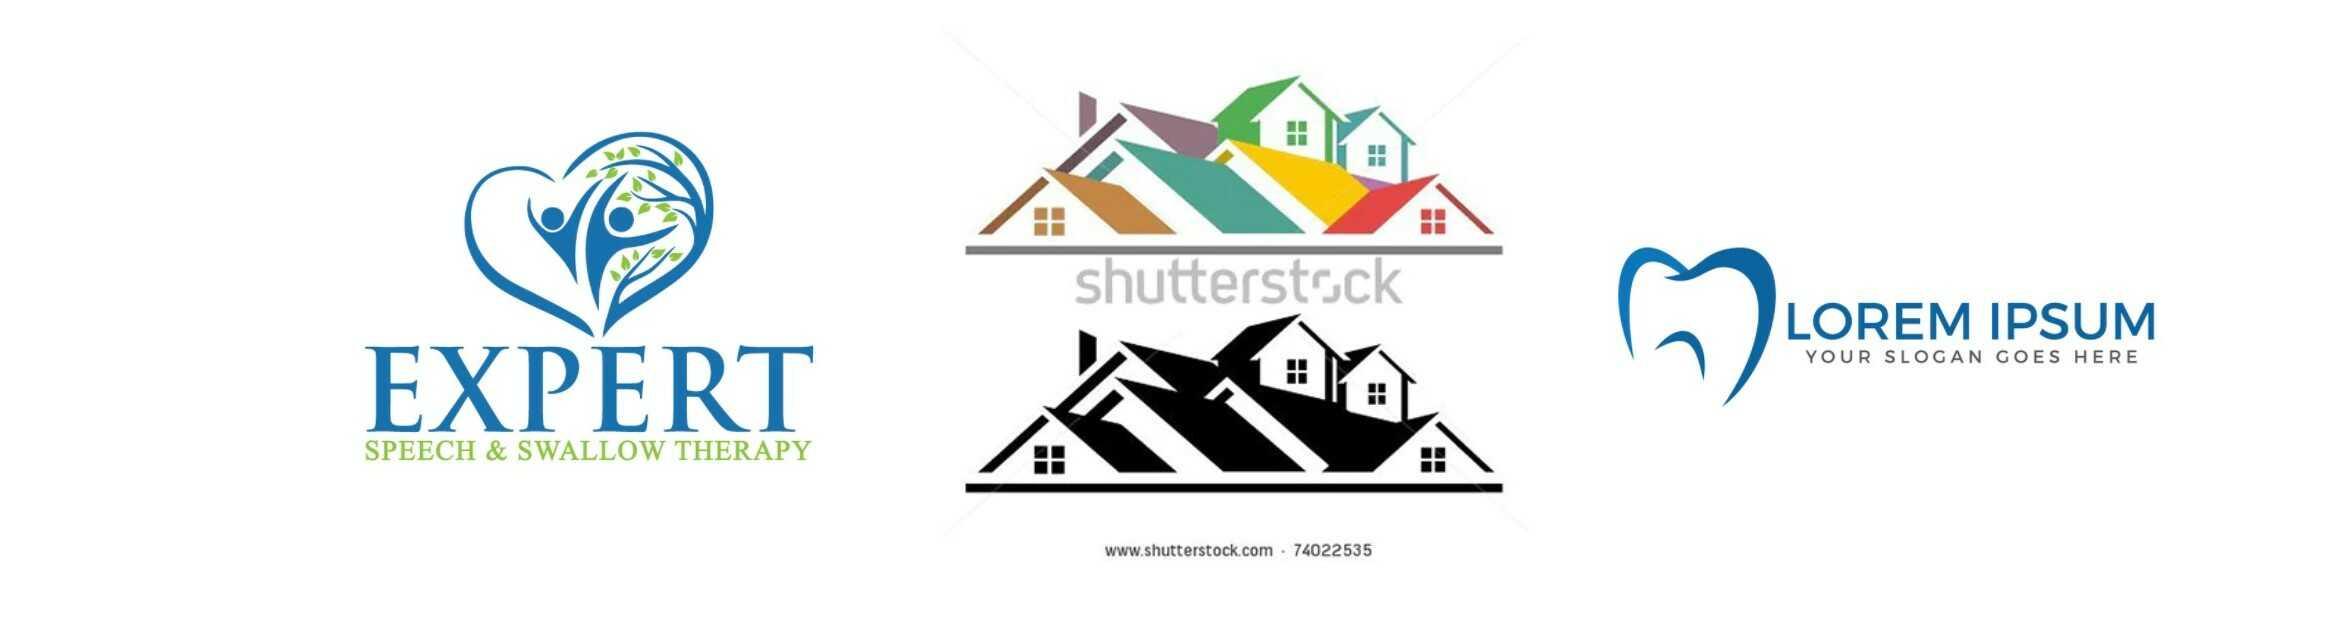 06-mnt-design-logo-xau(1)_optimized